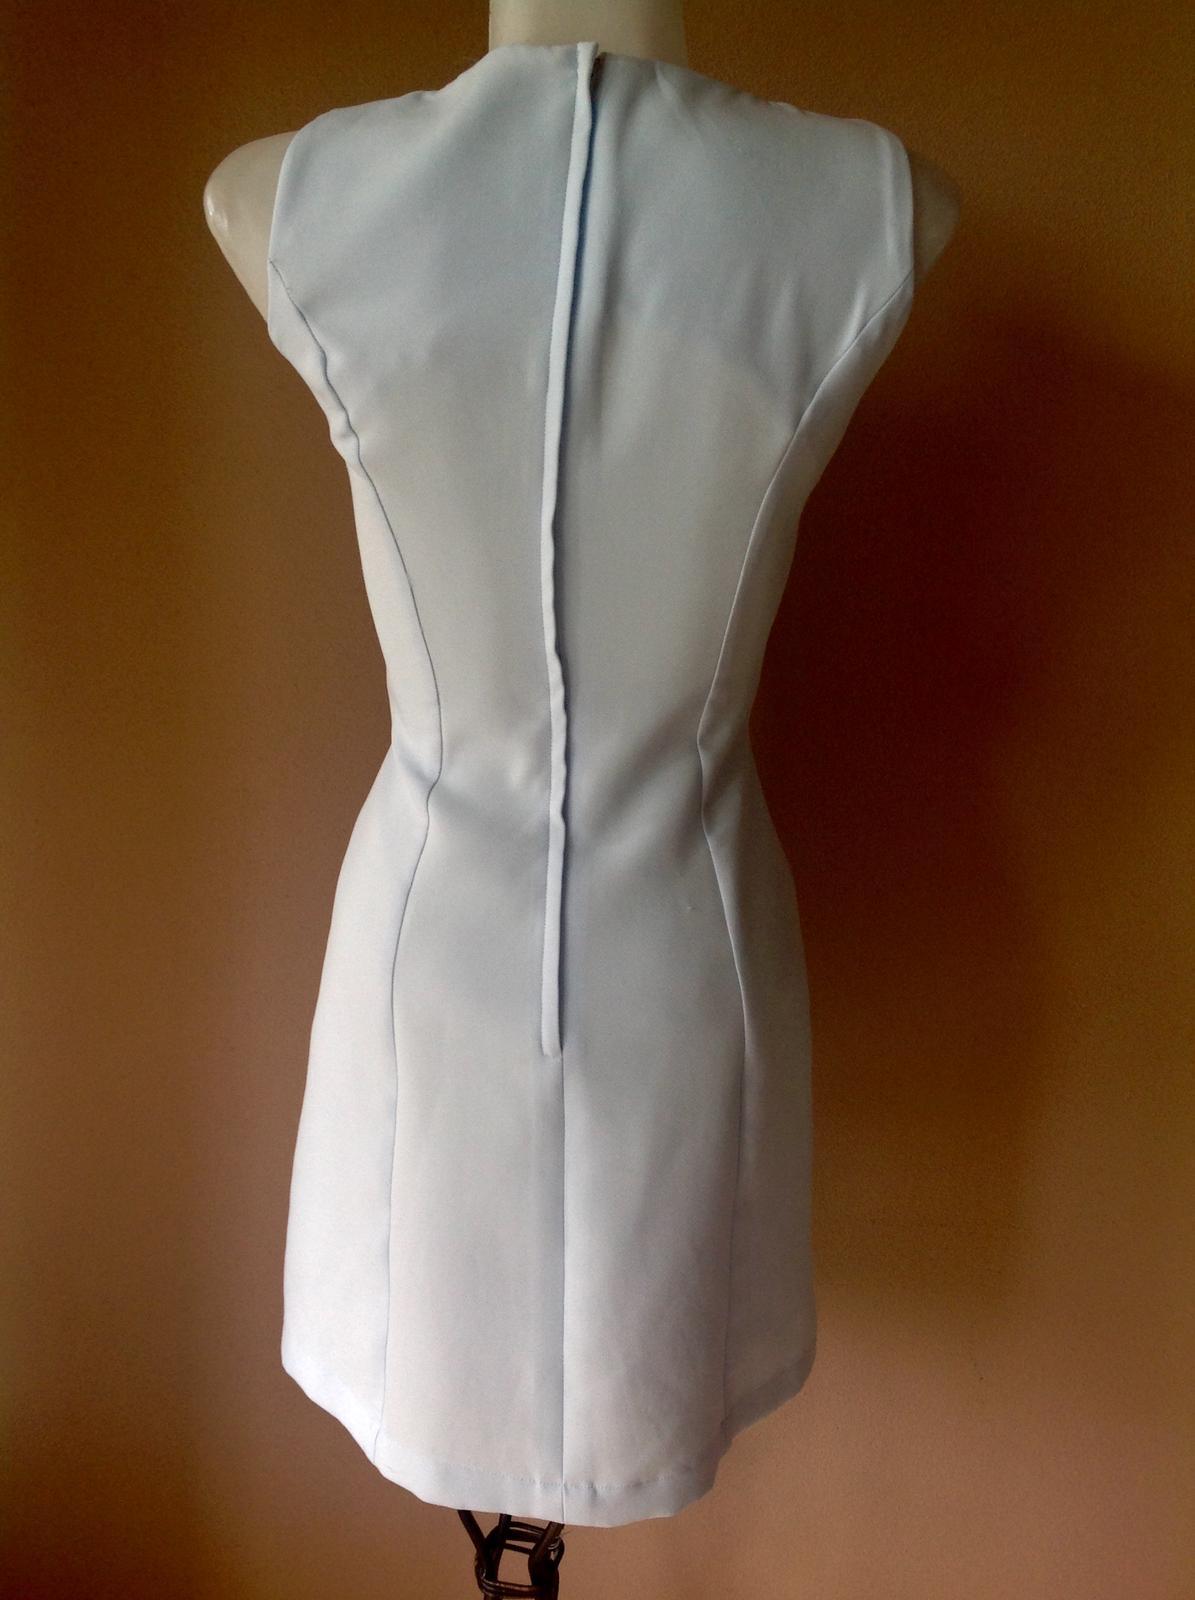 Šaty HENNES - Obrázok č. 3